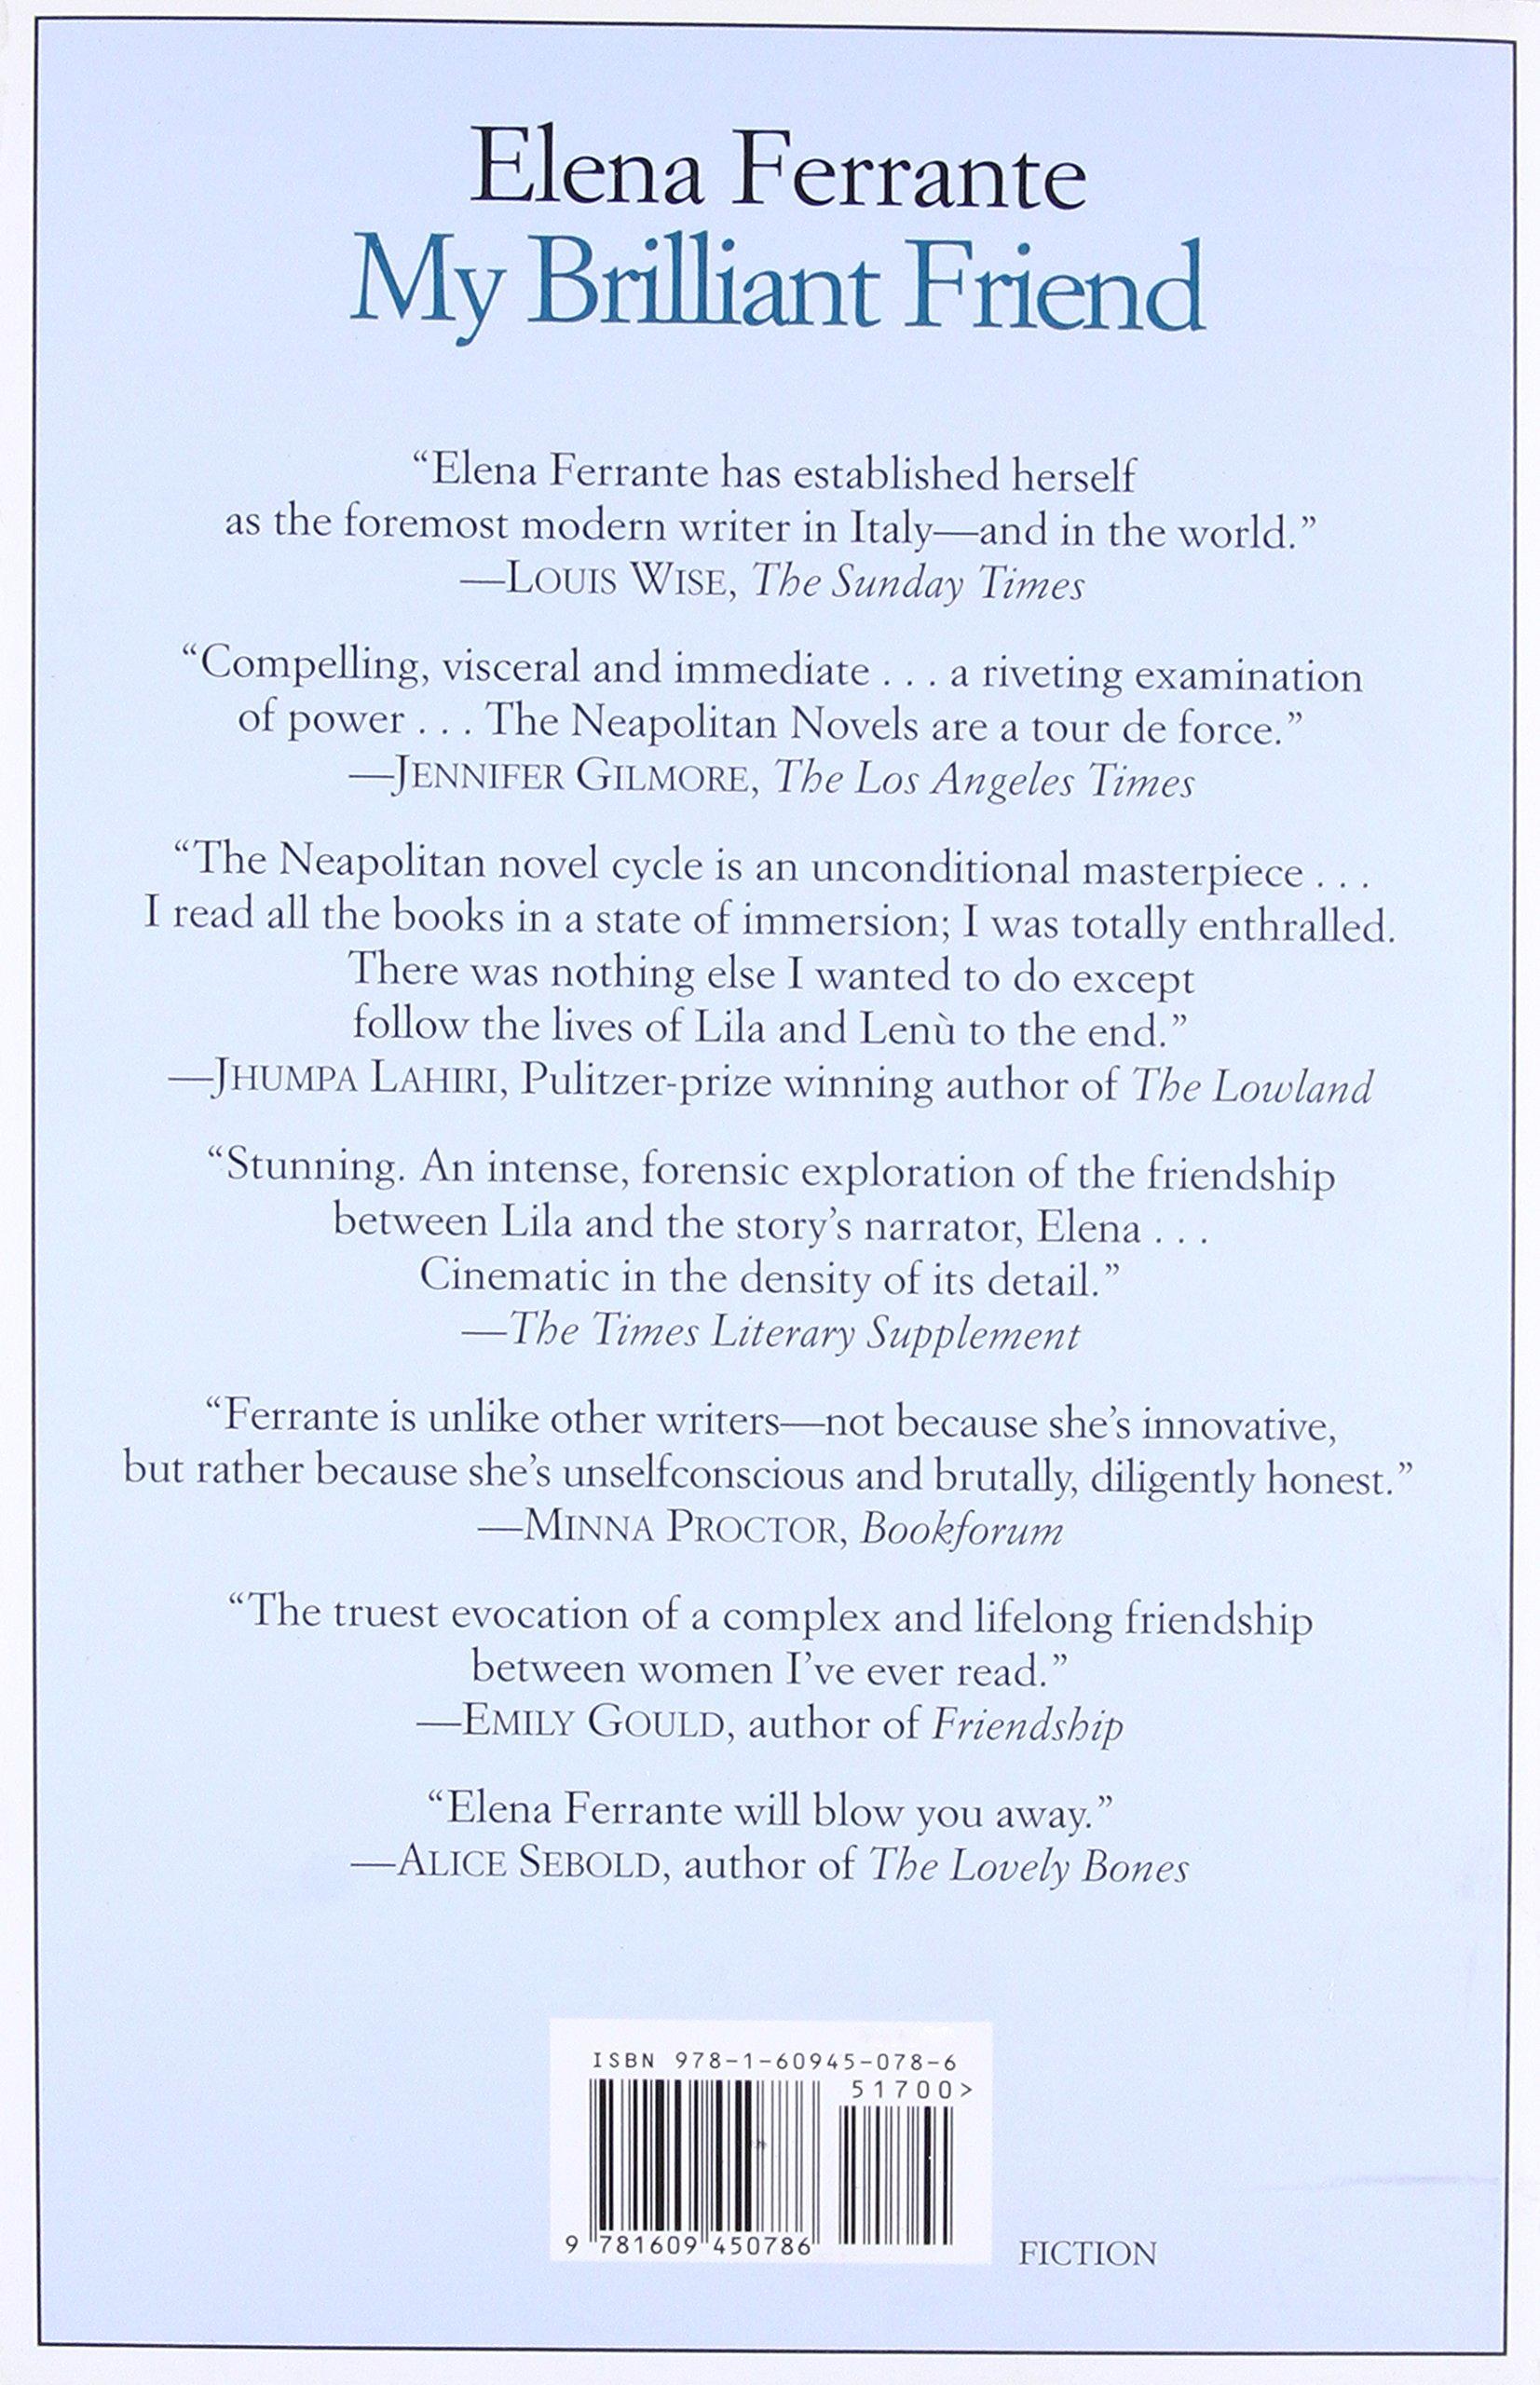 My Brilliant Friend: 1 (Neapolitan Novels 1): Amazon.es: Vv.Aa.: Libros en idiomas extranjeros